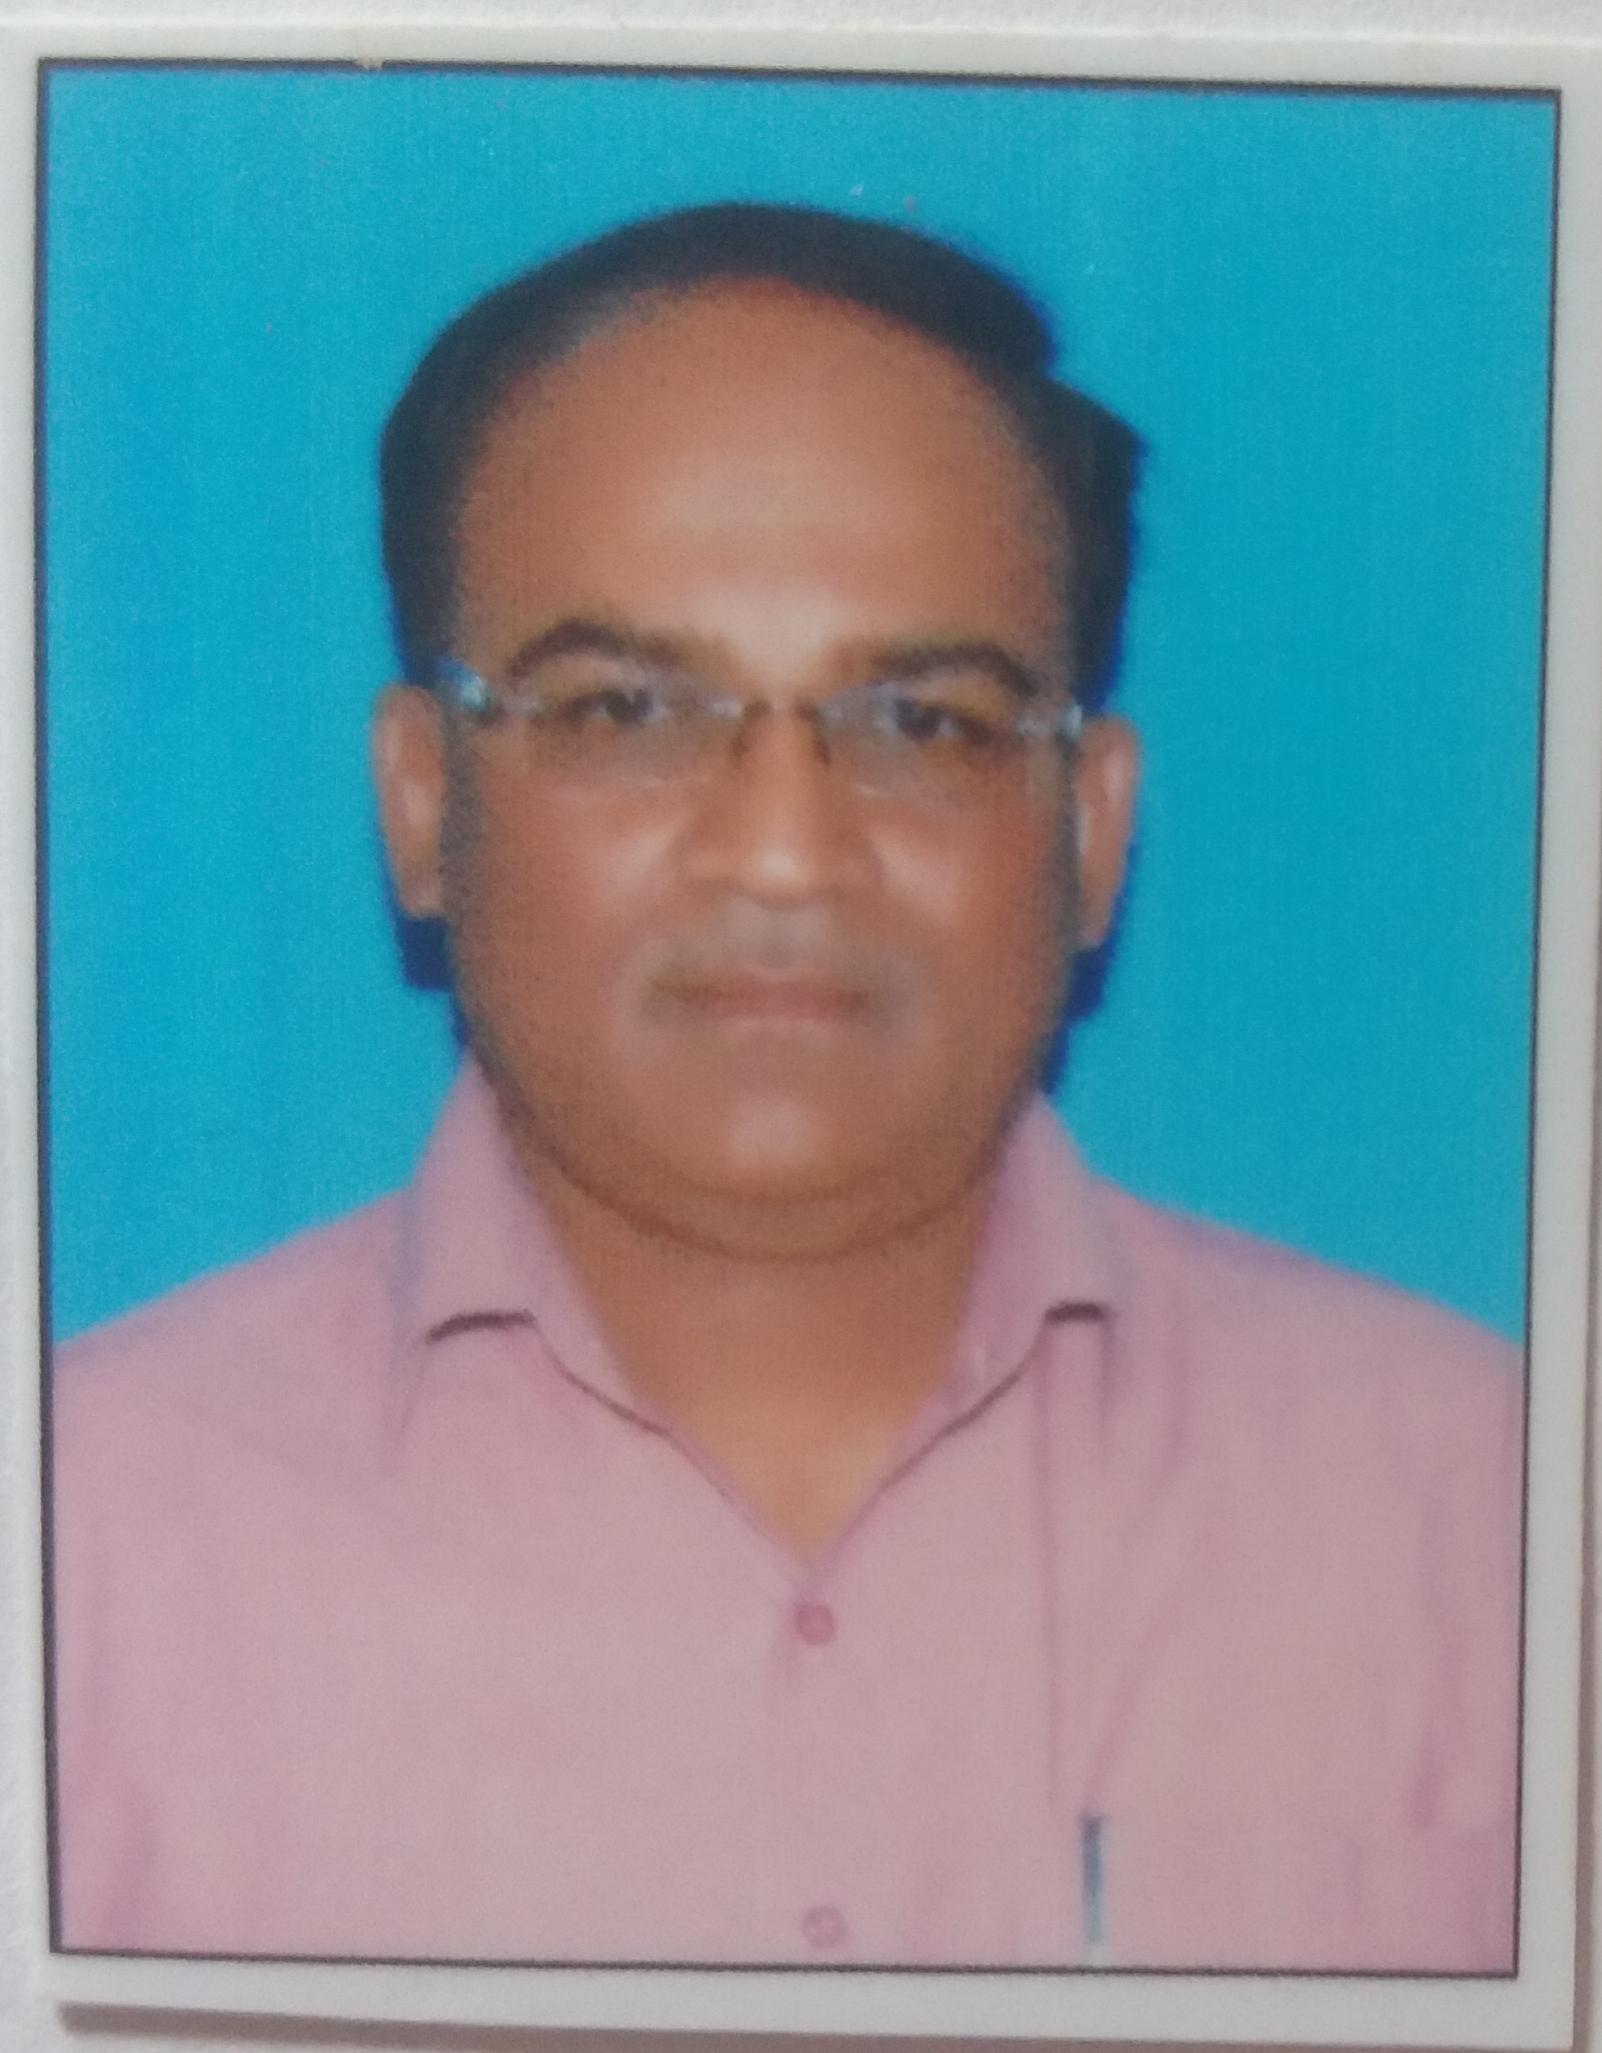 Dhone Appasaheb Sharanappa